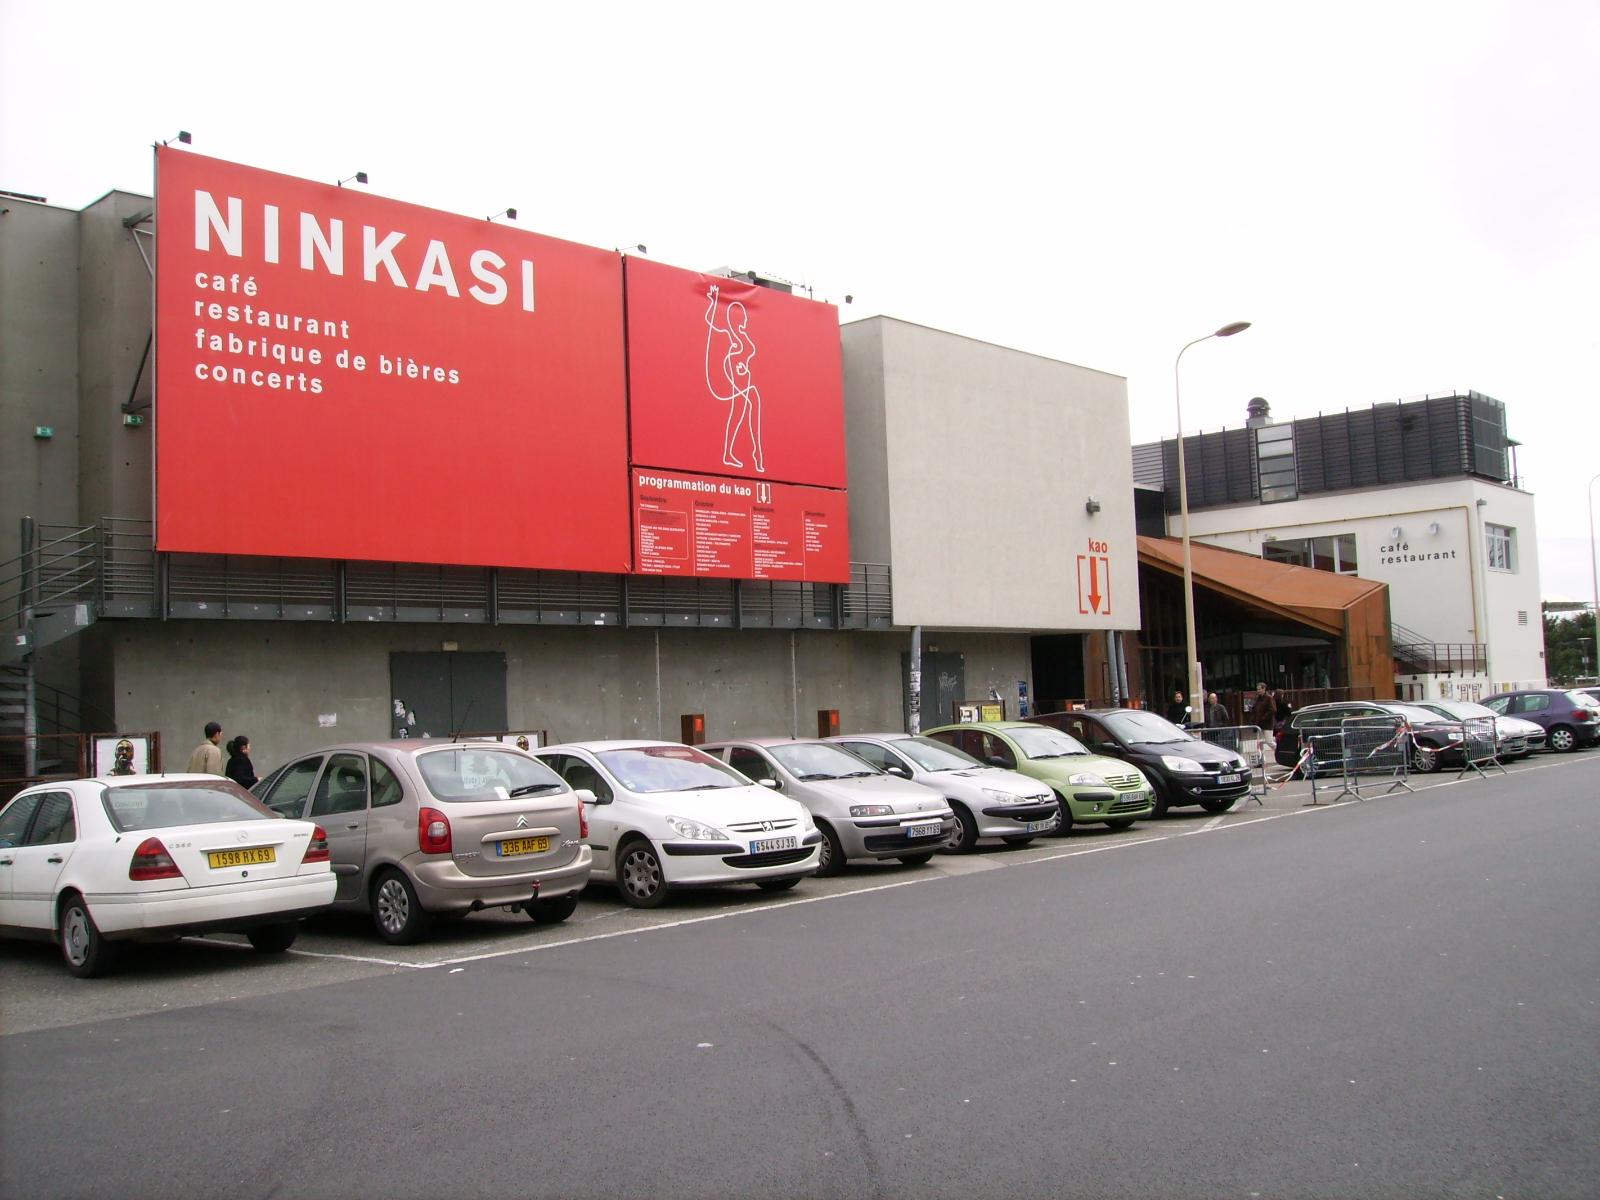 File:Ninkasi kao Lyon7 fr.JPG - Wikimedia Commons